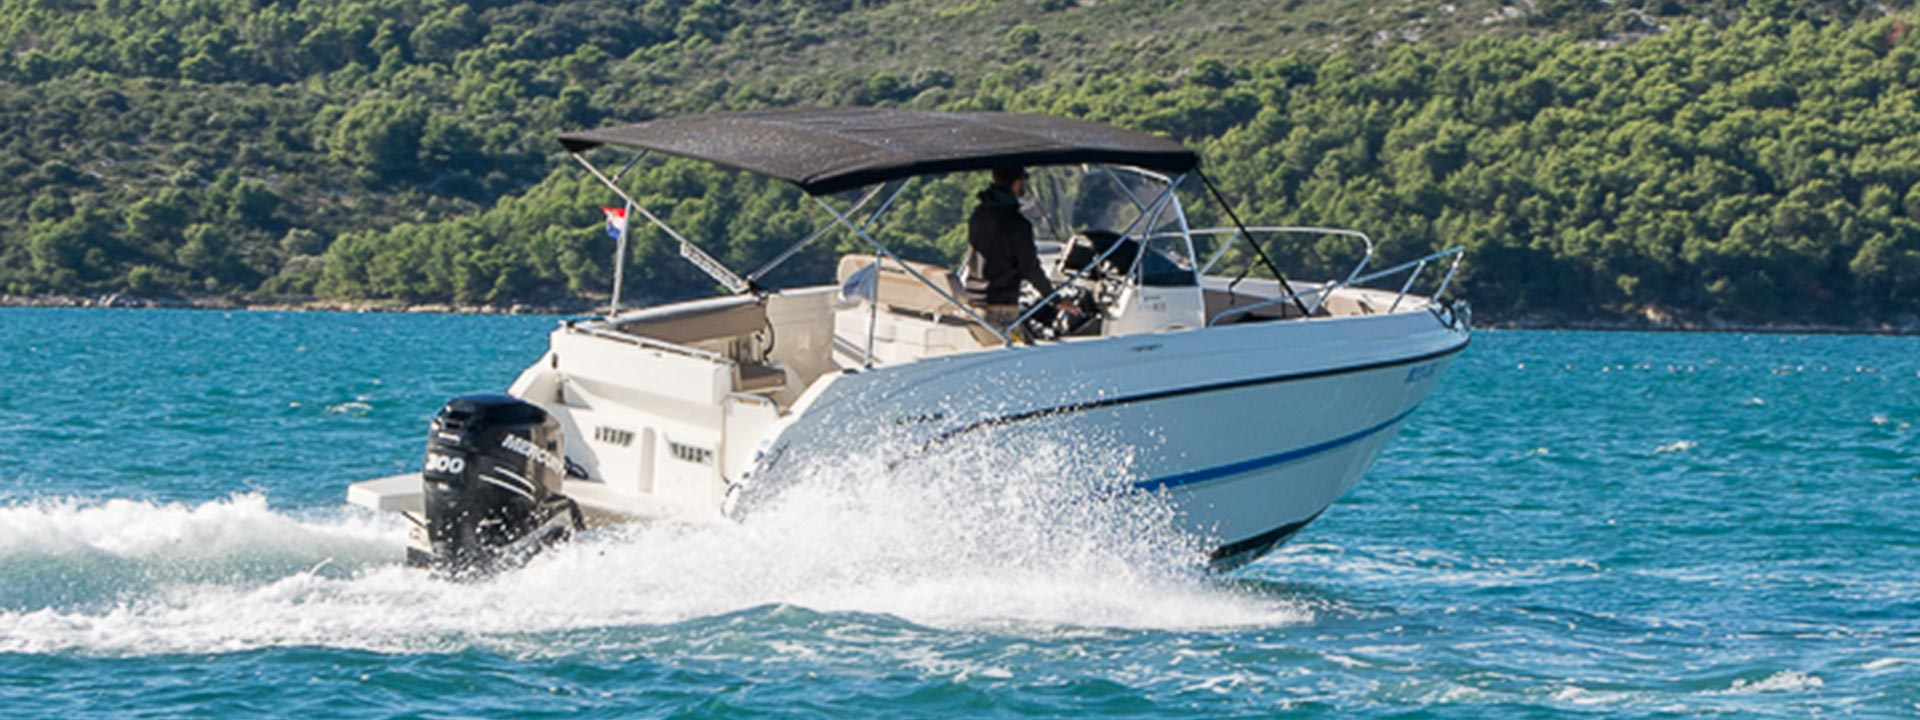 mayer-charter-boat-header-jeanneau-quicksilver-actv-805-01